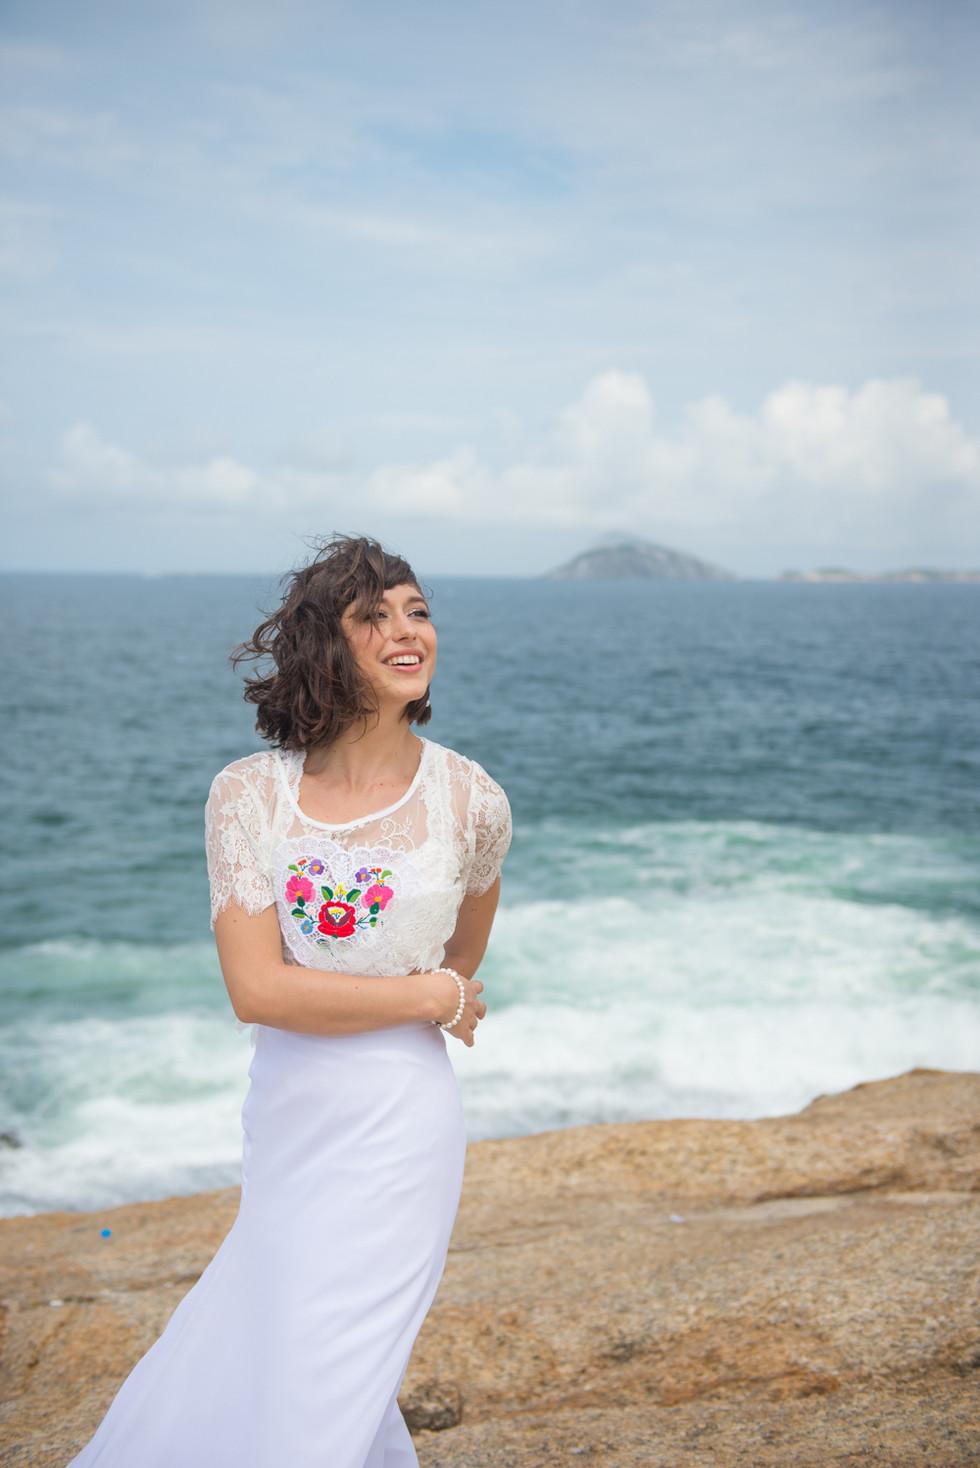 the Brazilian girl-46.jpg